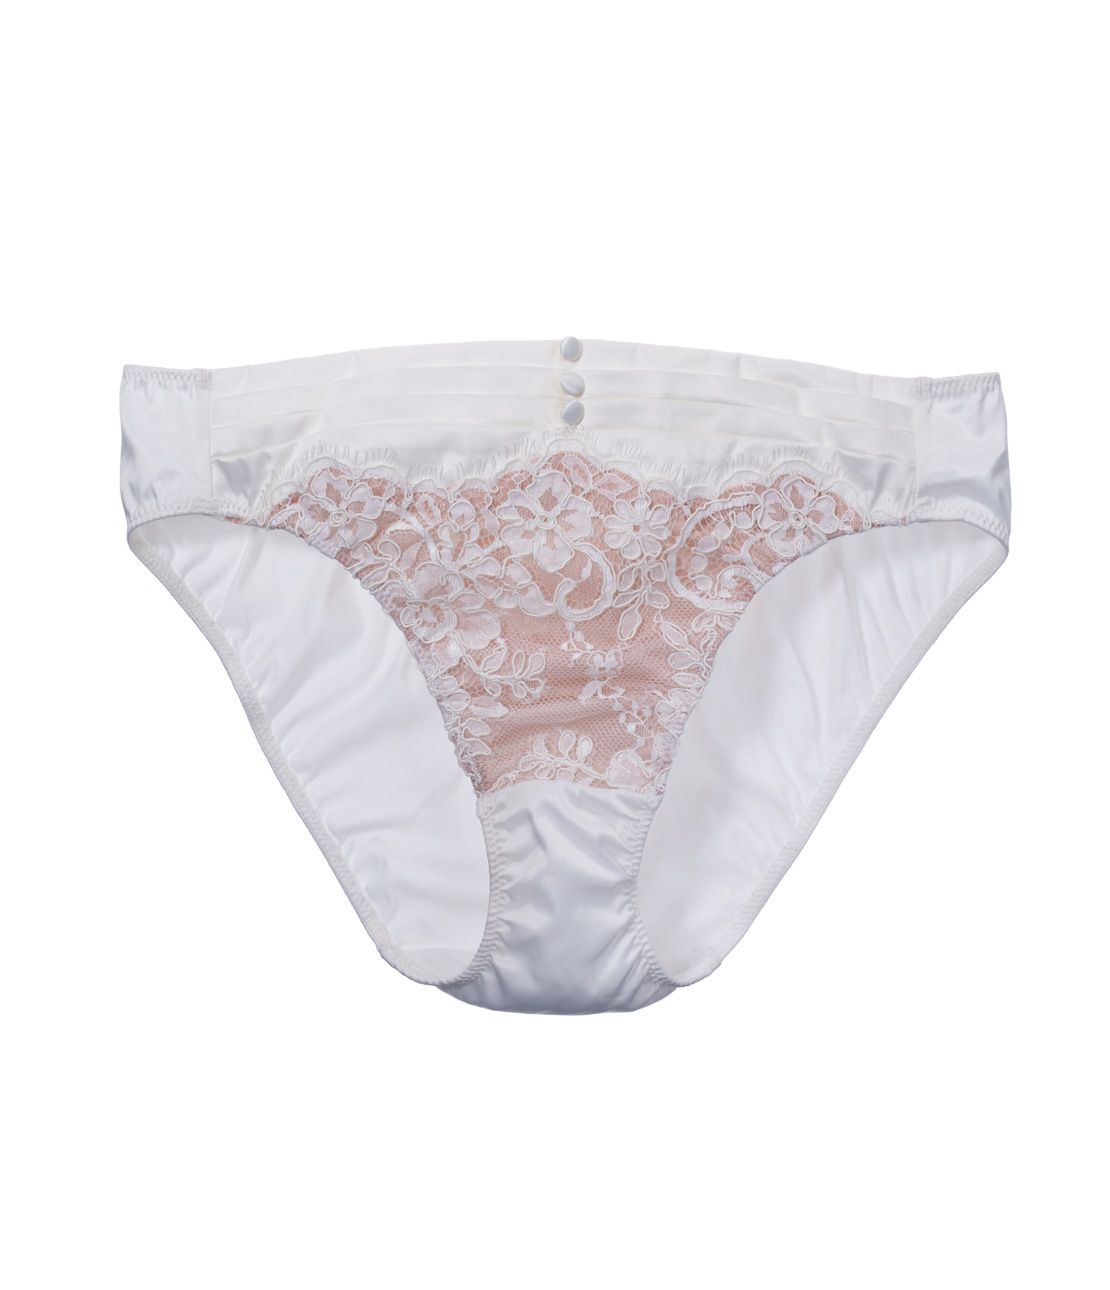 Robe de Marie panty